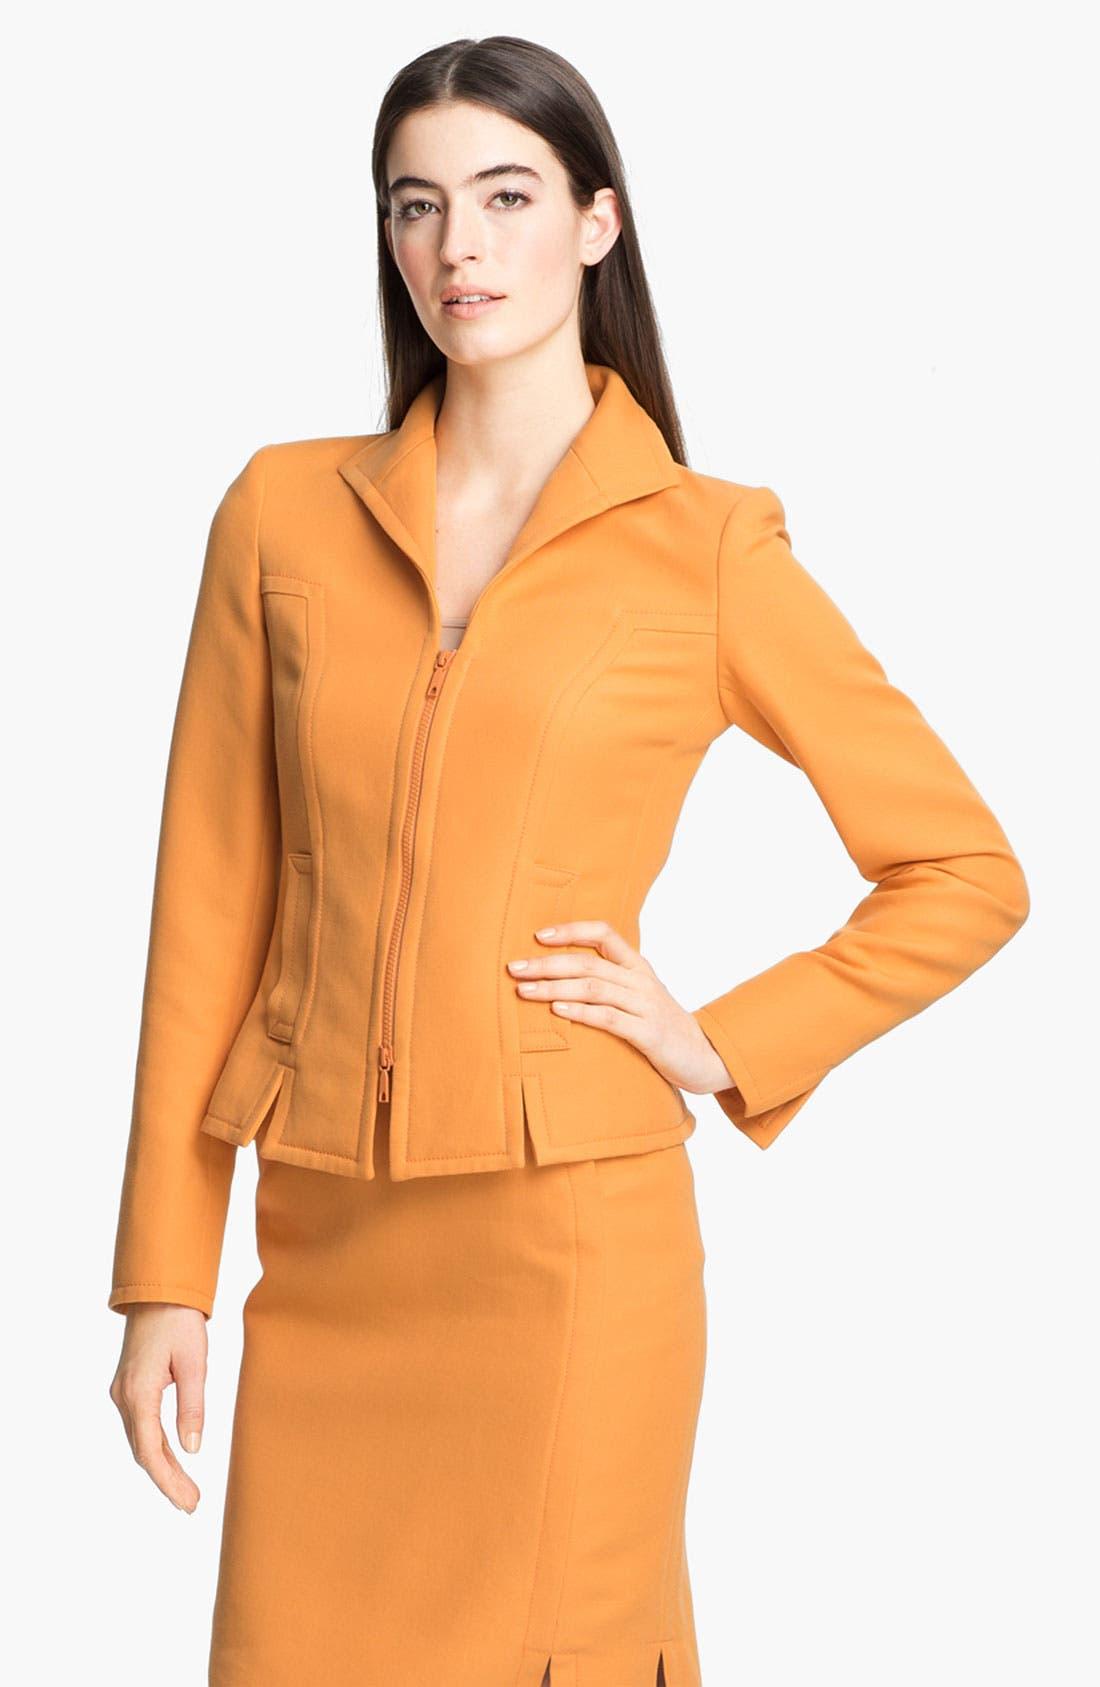 Alternate Image 1 Selected - Lafayette 148 New York 'Loretta - Retro Cloth' Jacket